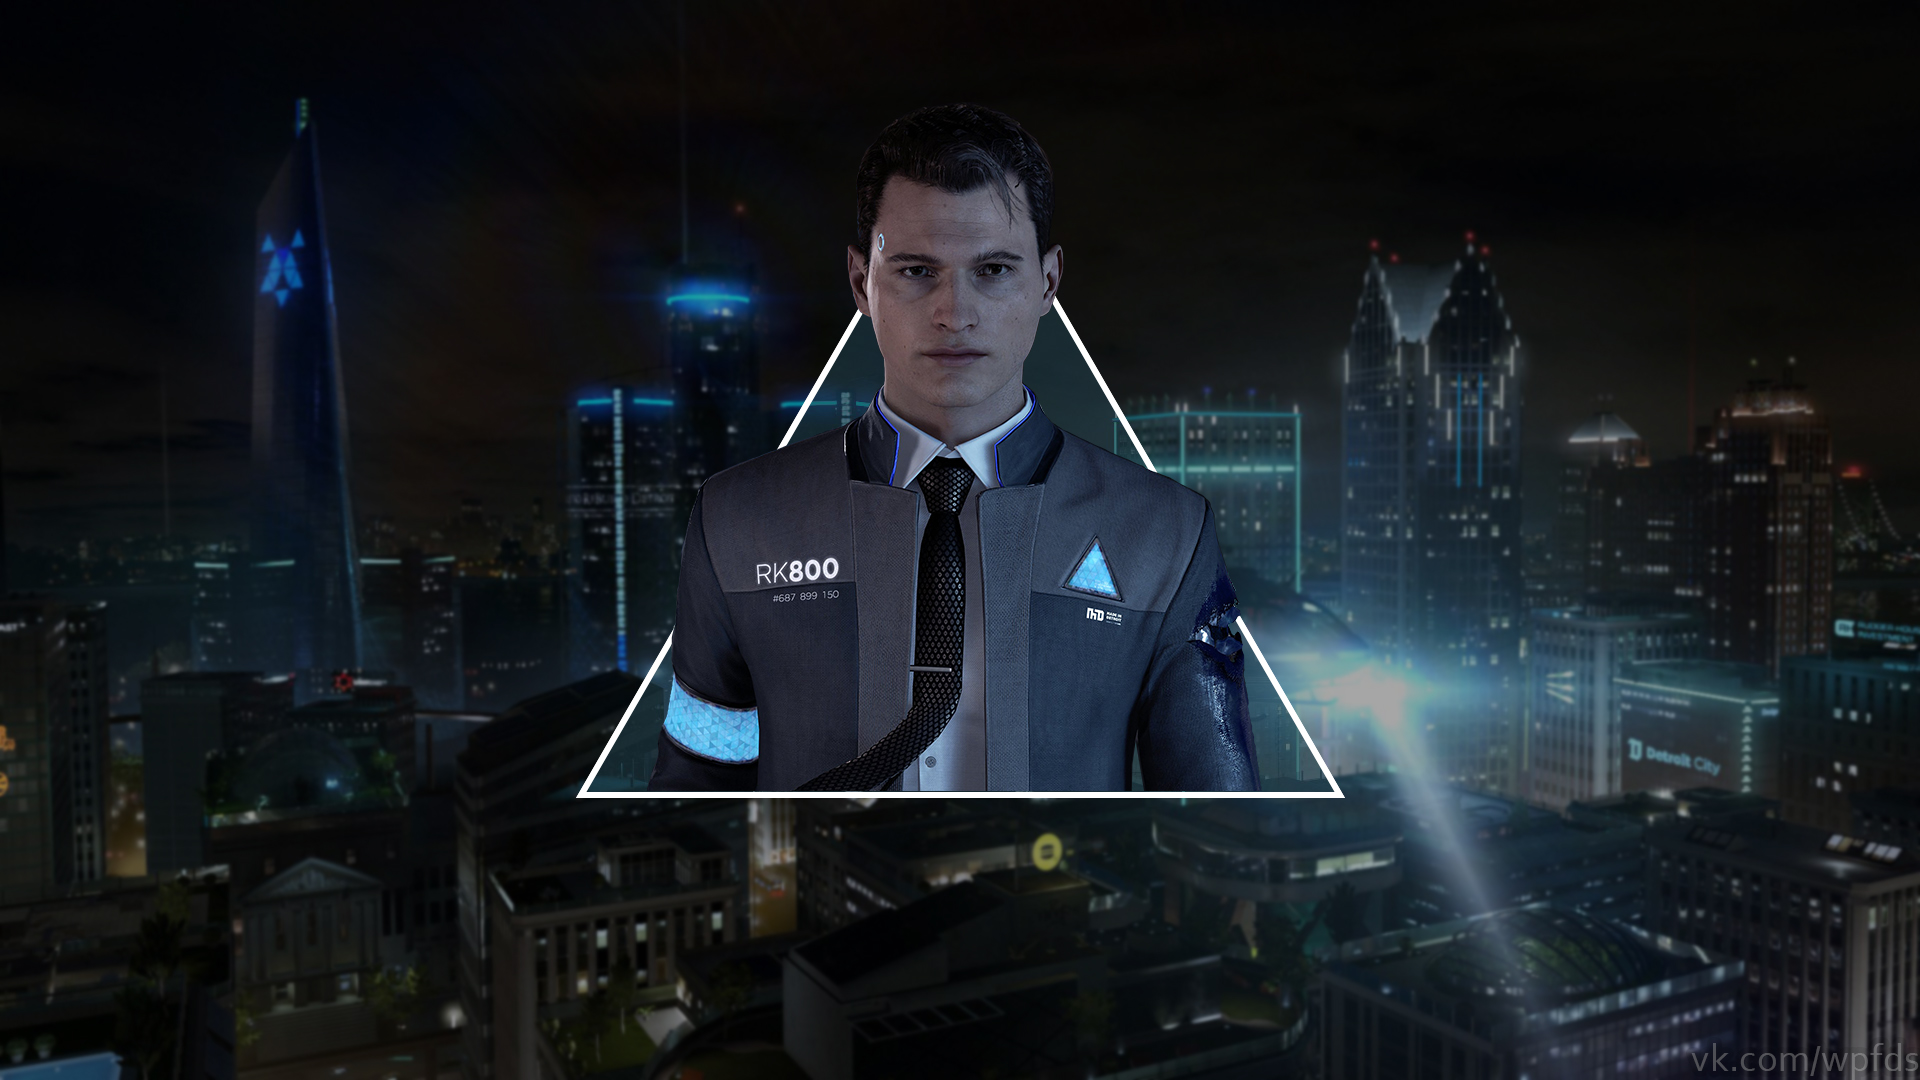 detroit become human detroit: become human connor (detroit: become human) video games